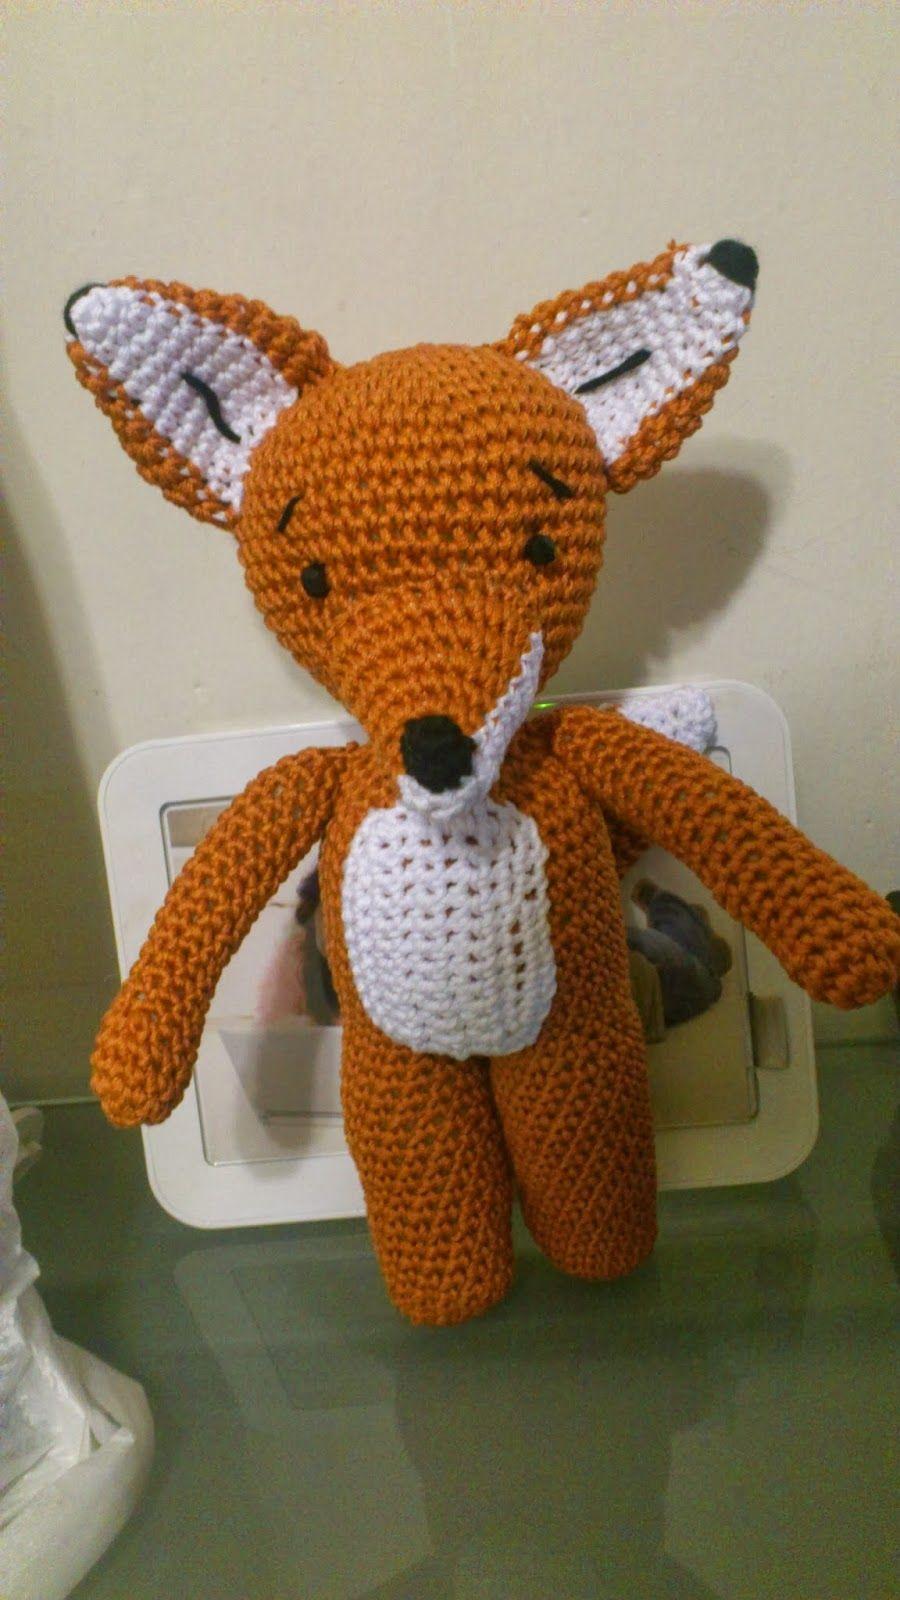 PATRON ZORRO, OSO, CHANGO AMIGURUMI | crochet | Pinterest ...